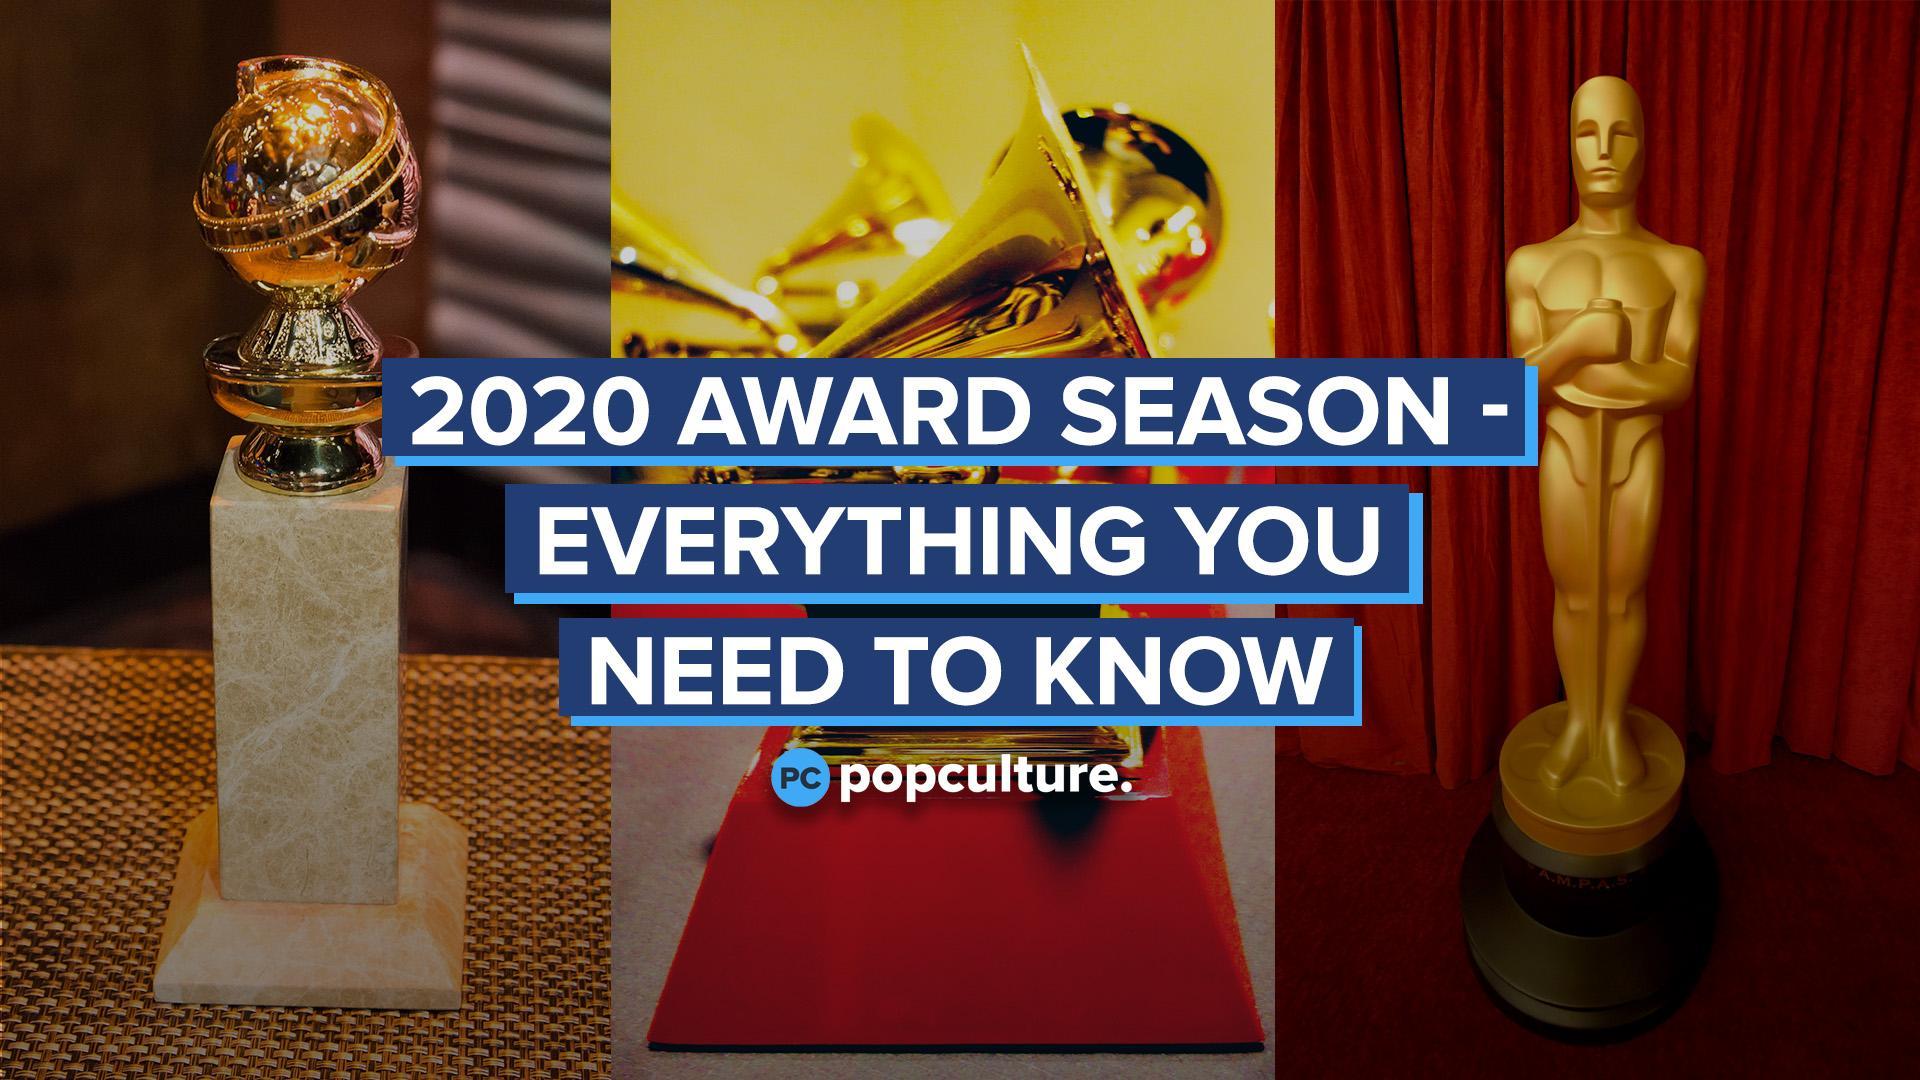 2020 Award Season - Golden Globes, Grammys, Oscars and More screen capture